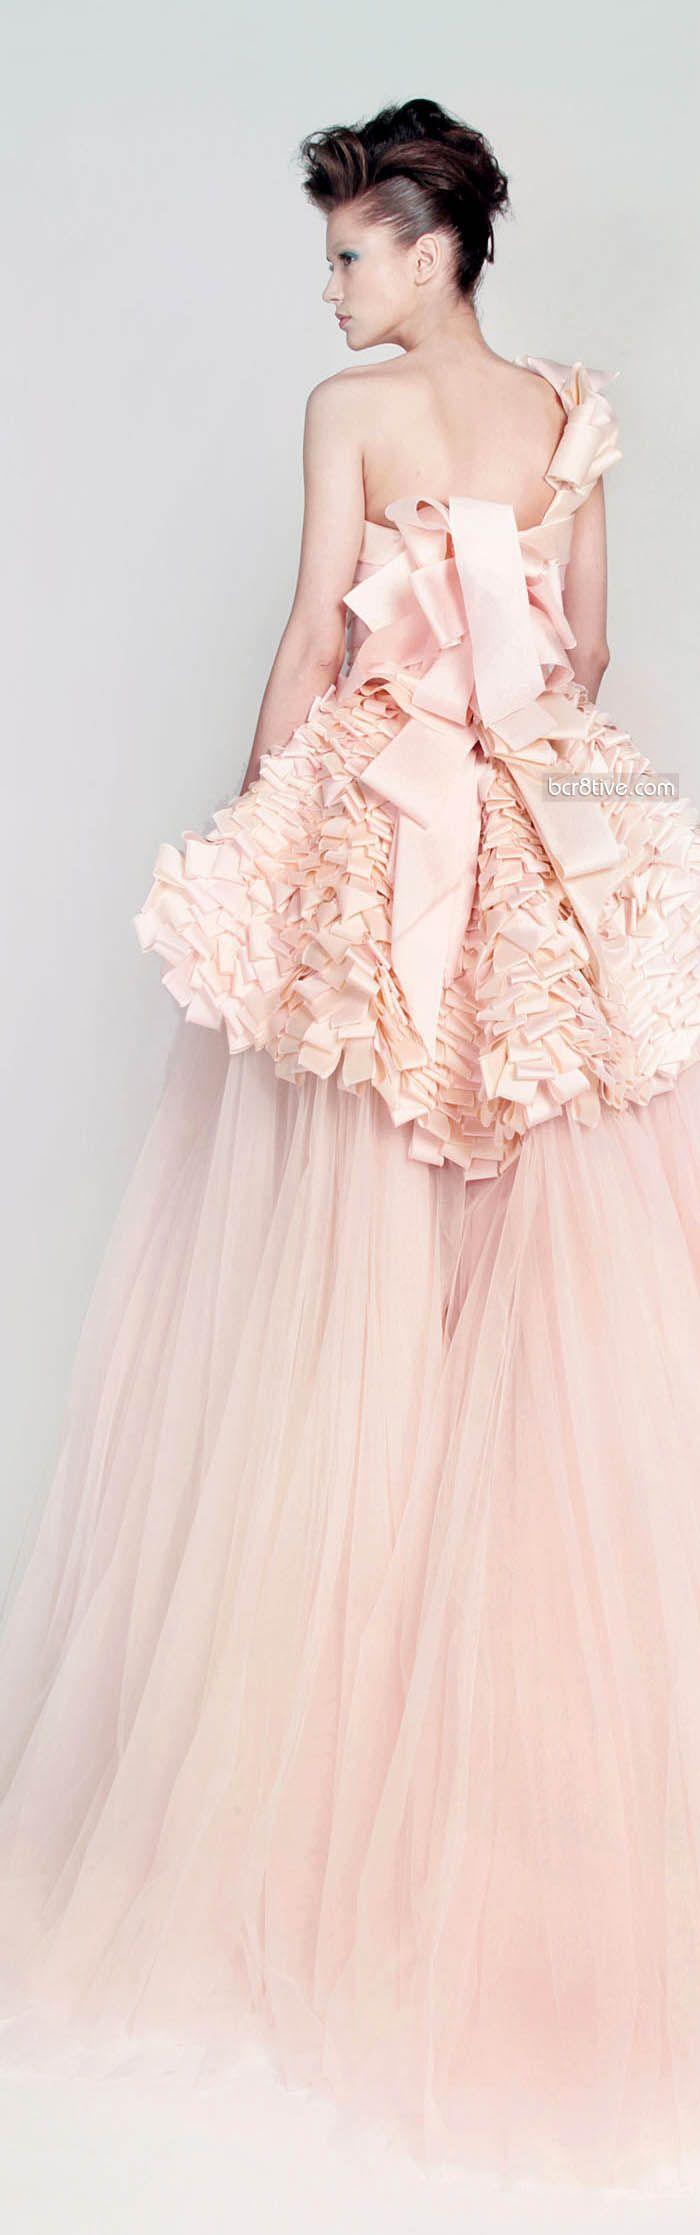 164 best miriana images on Pinterest | Gown wedding, Wedding ...